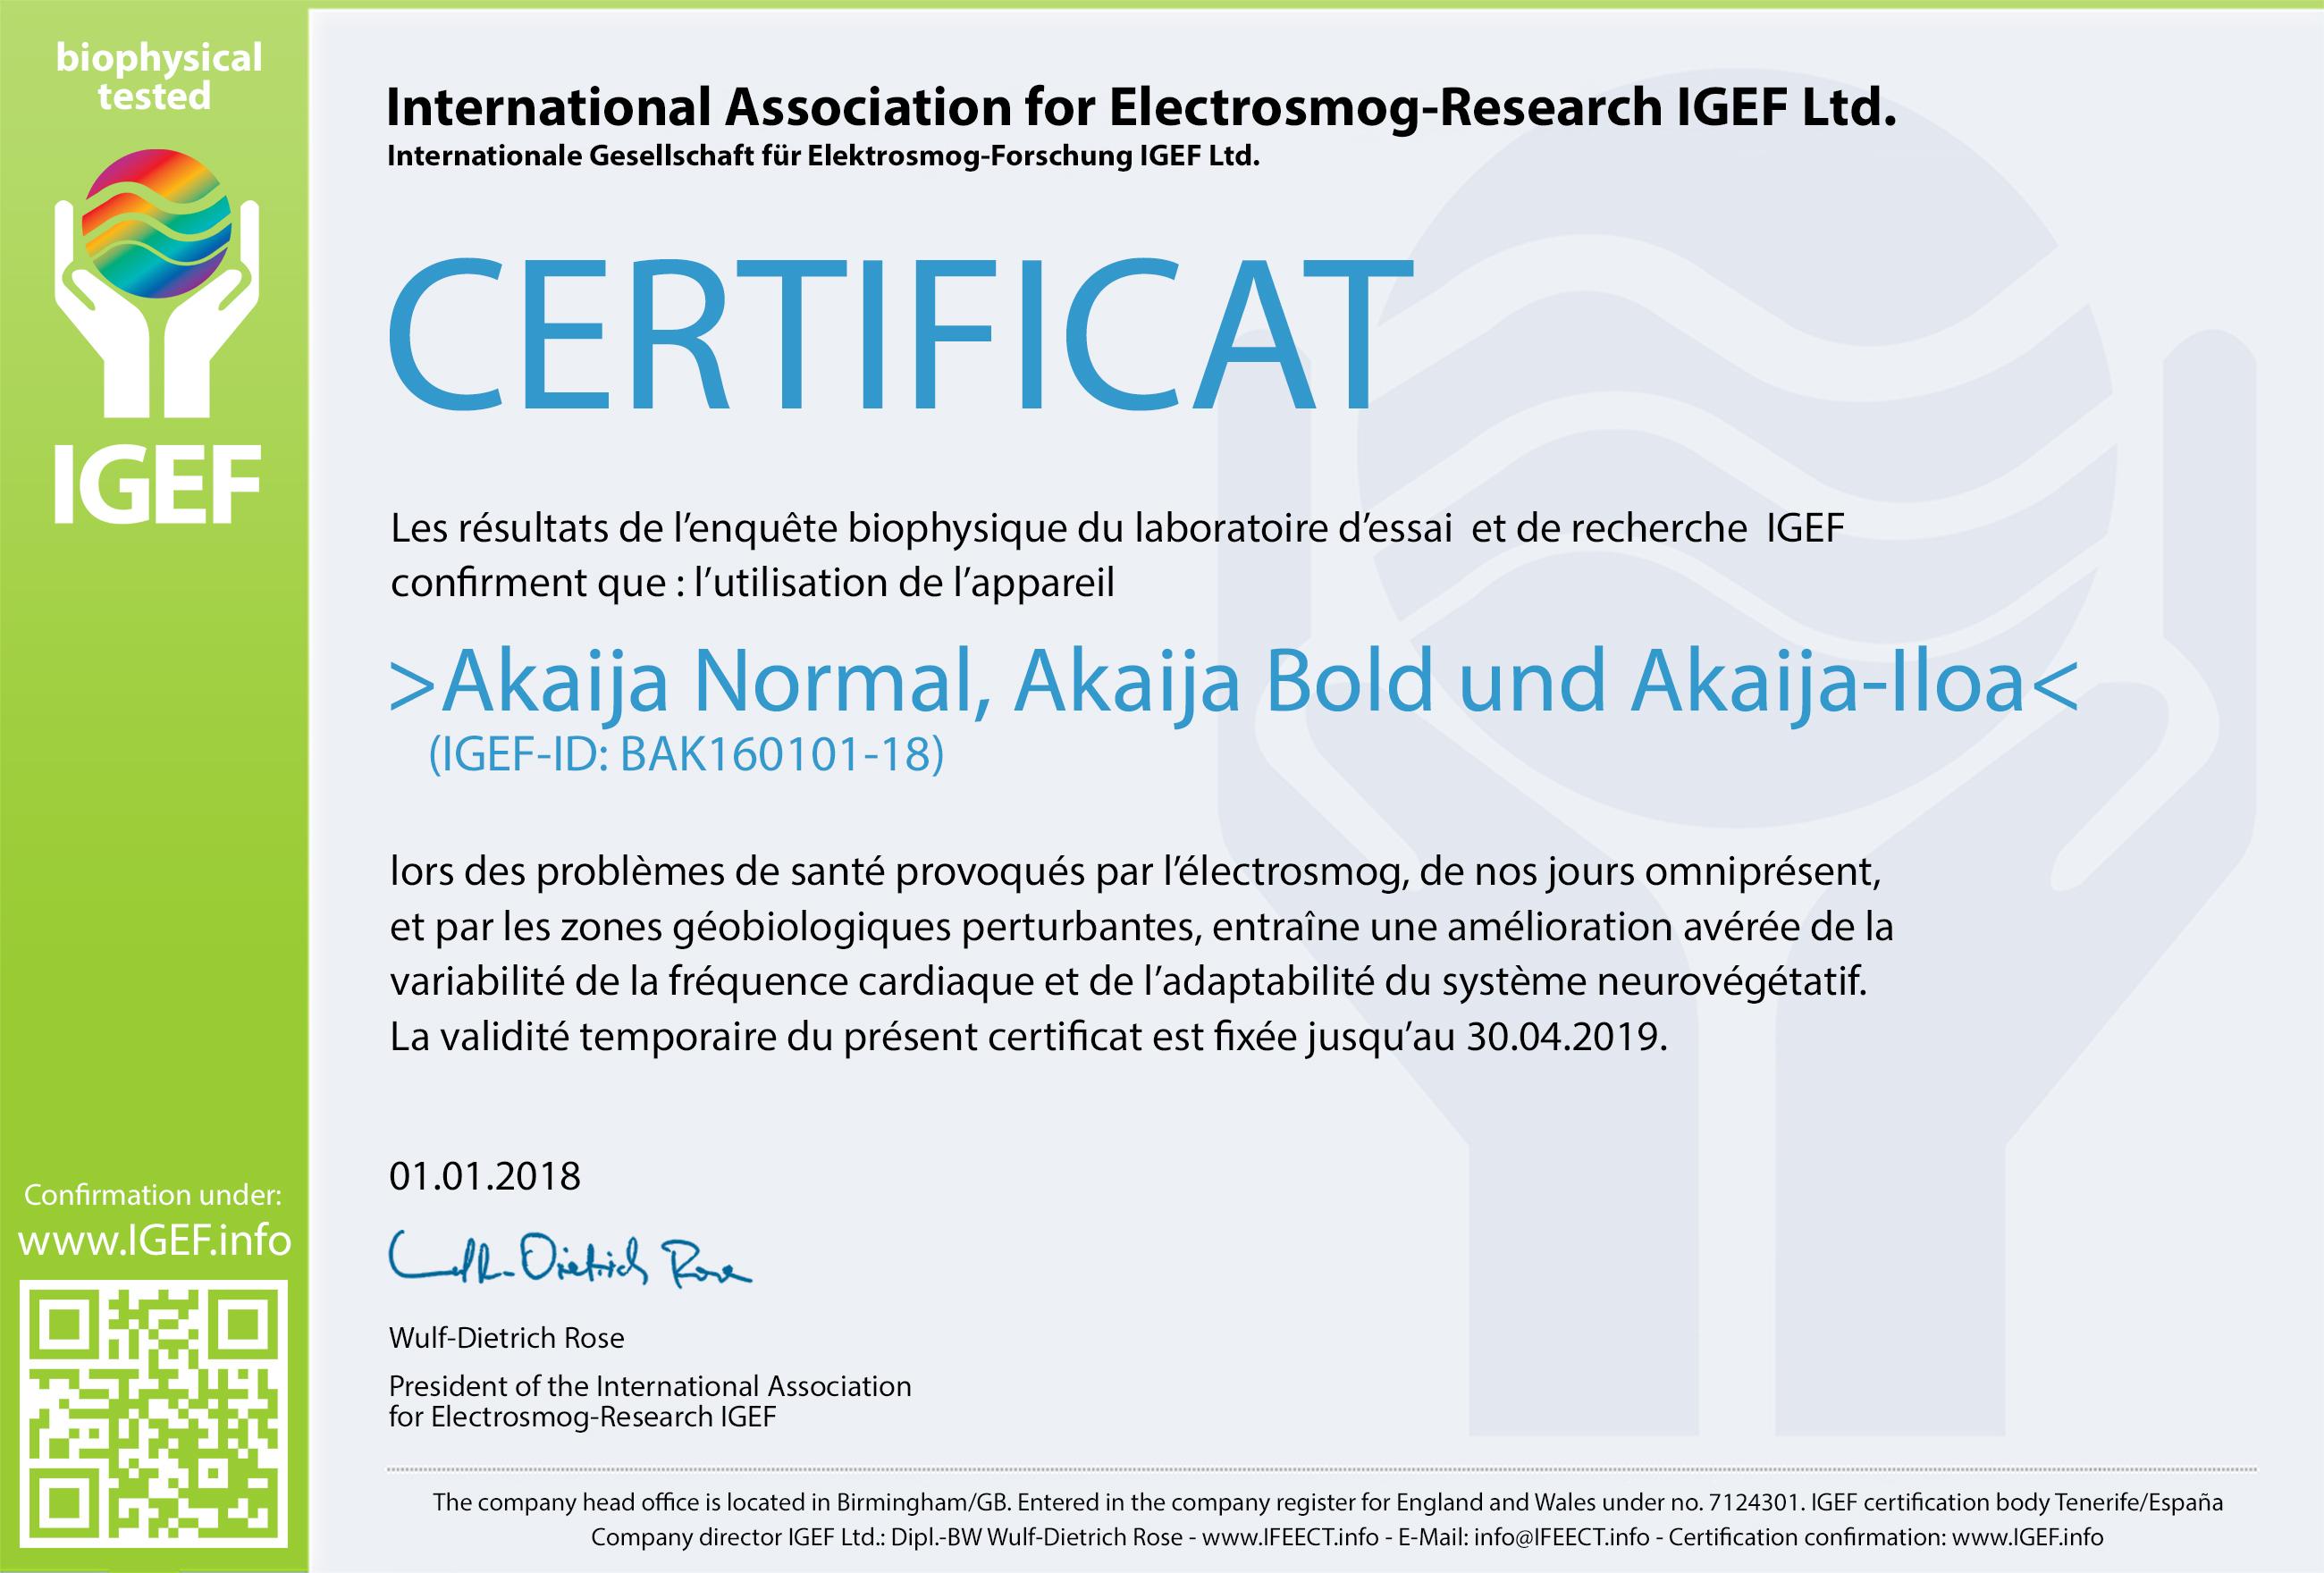 IGEF-Zertifikat-BAK-FR-18